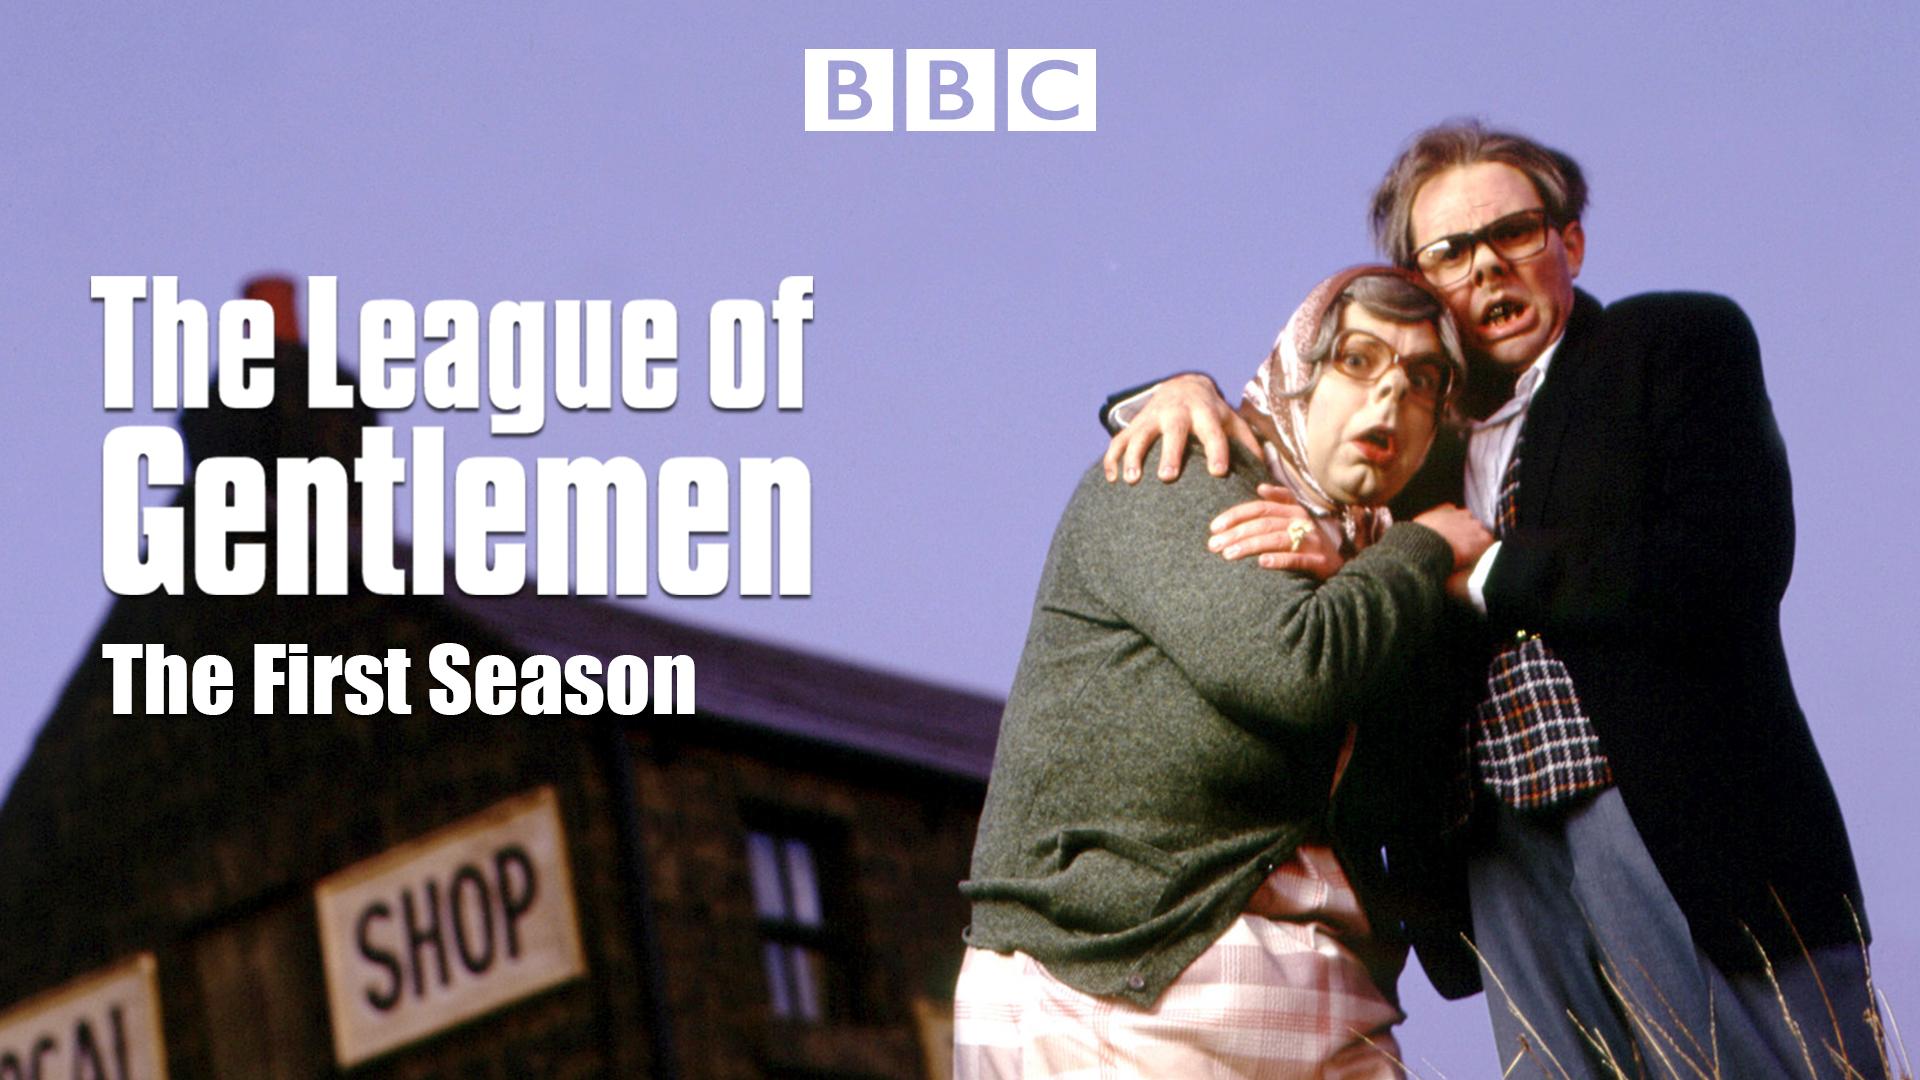 The League of Gentlemen, Season 1